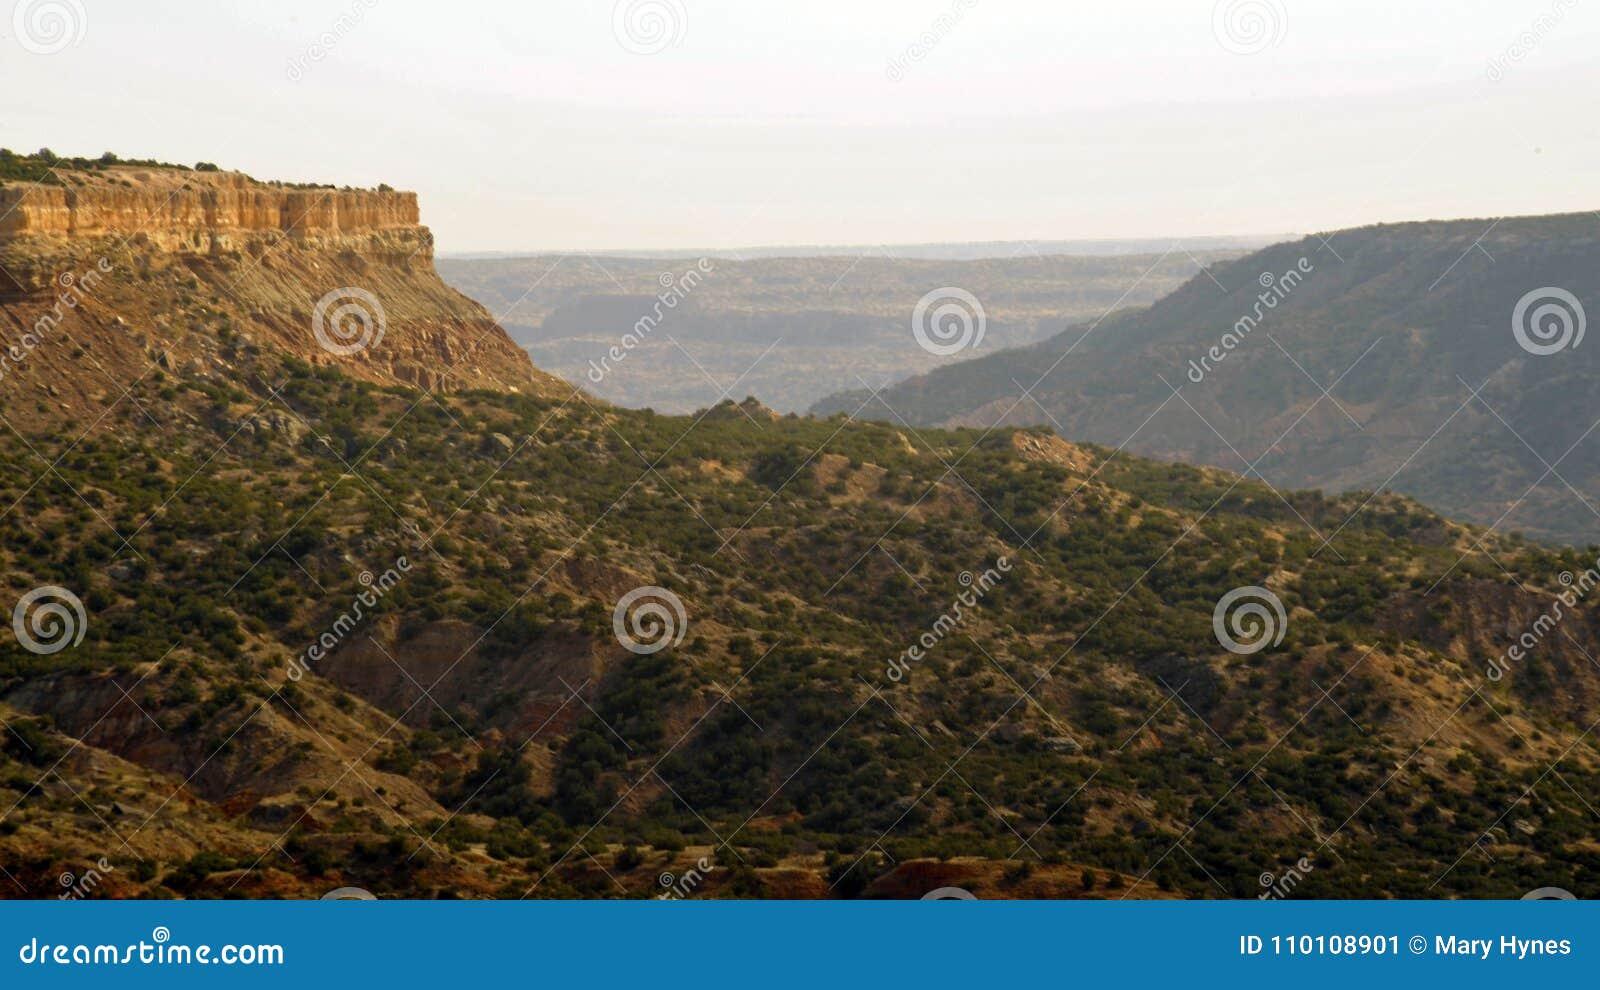 Palo杜罗峡谷n得克萨斯-西部风景